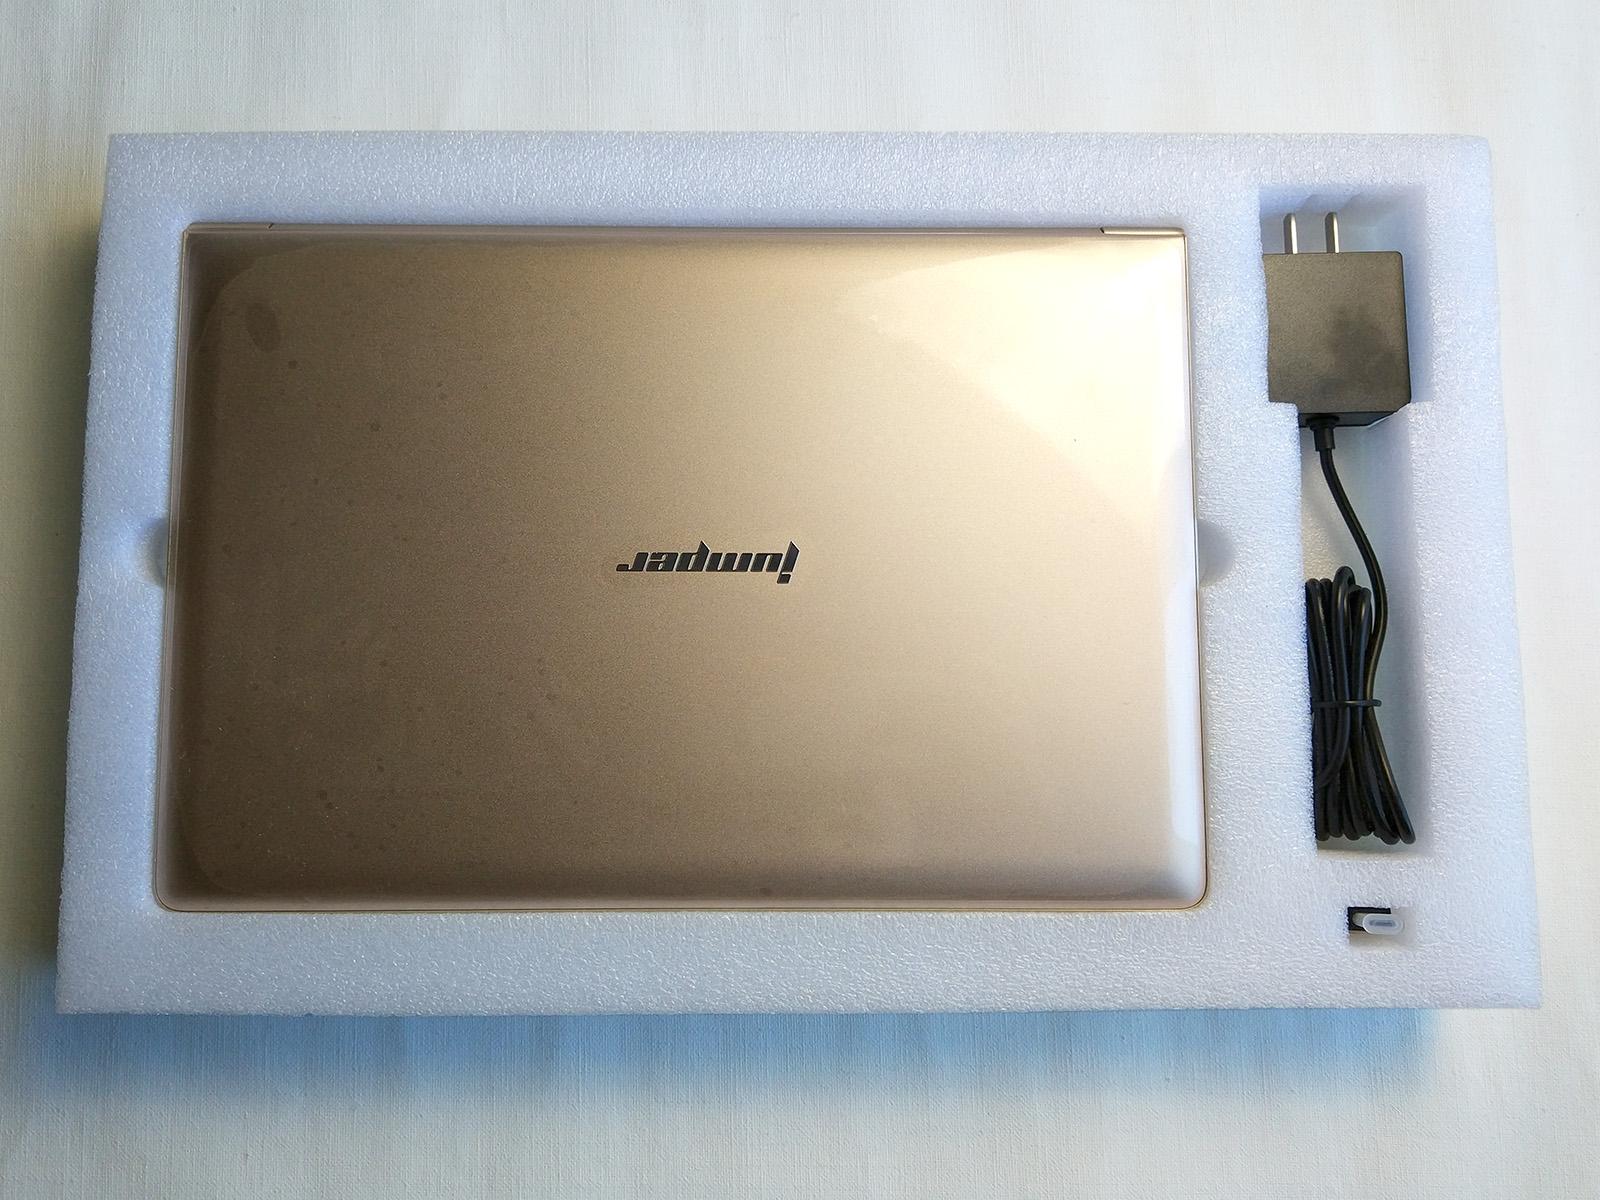 jumper-ezbook-air-first-look-unboxing-02